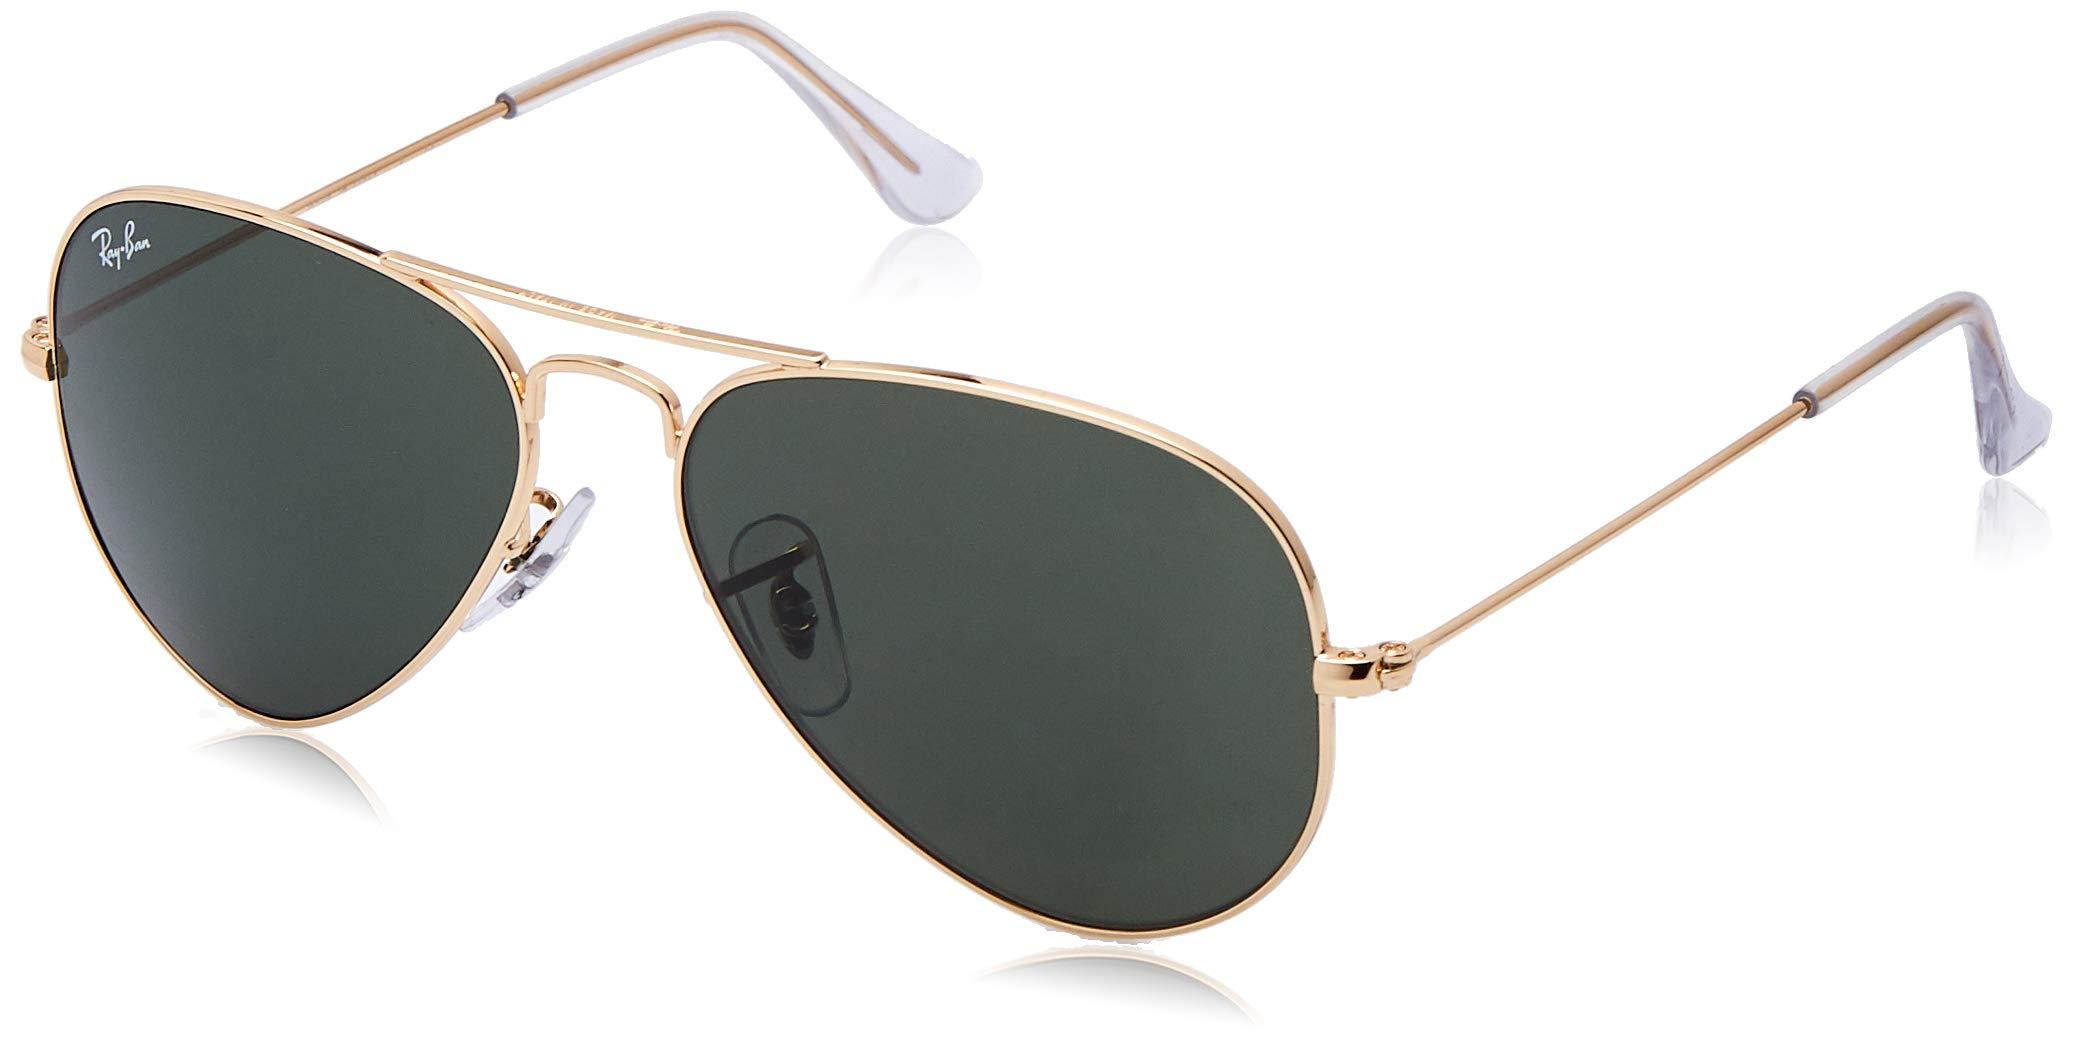 RAY-BAN RB3025 Aviator Large Metal Sunglasses, Gold/Dark Green Crystal, 55 mm by RAY-BAN